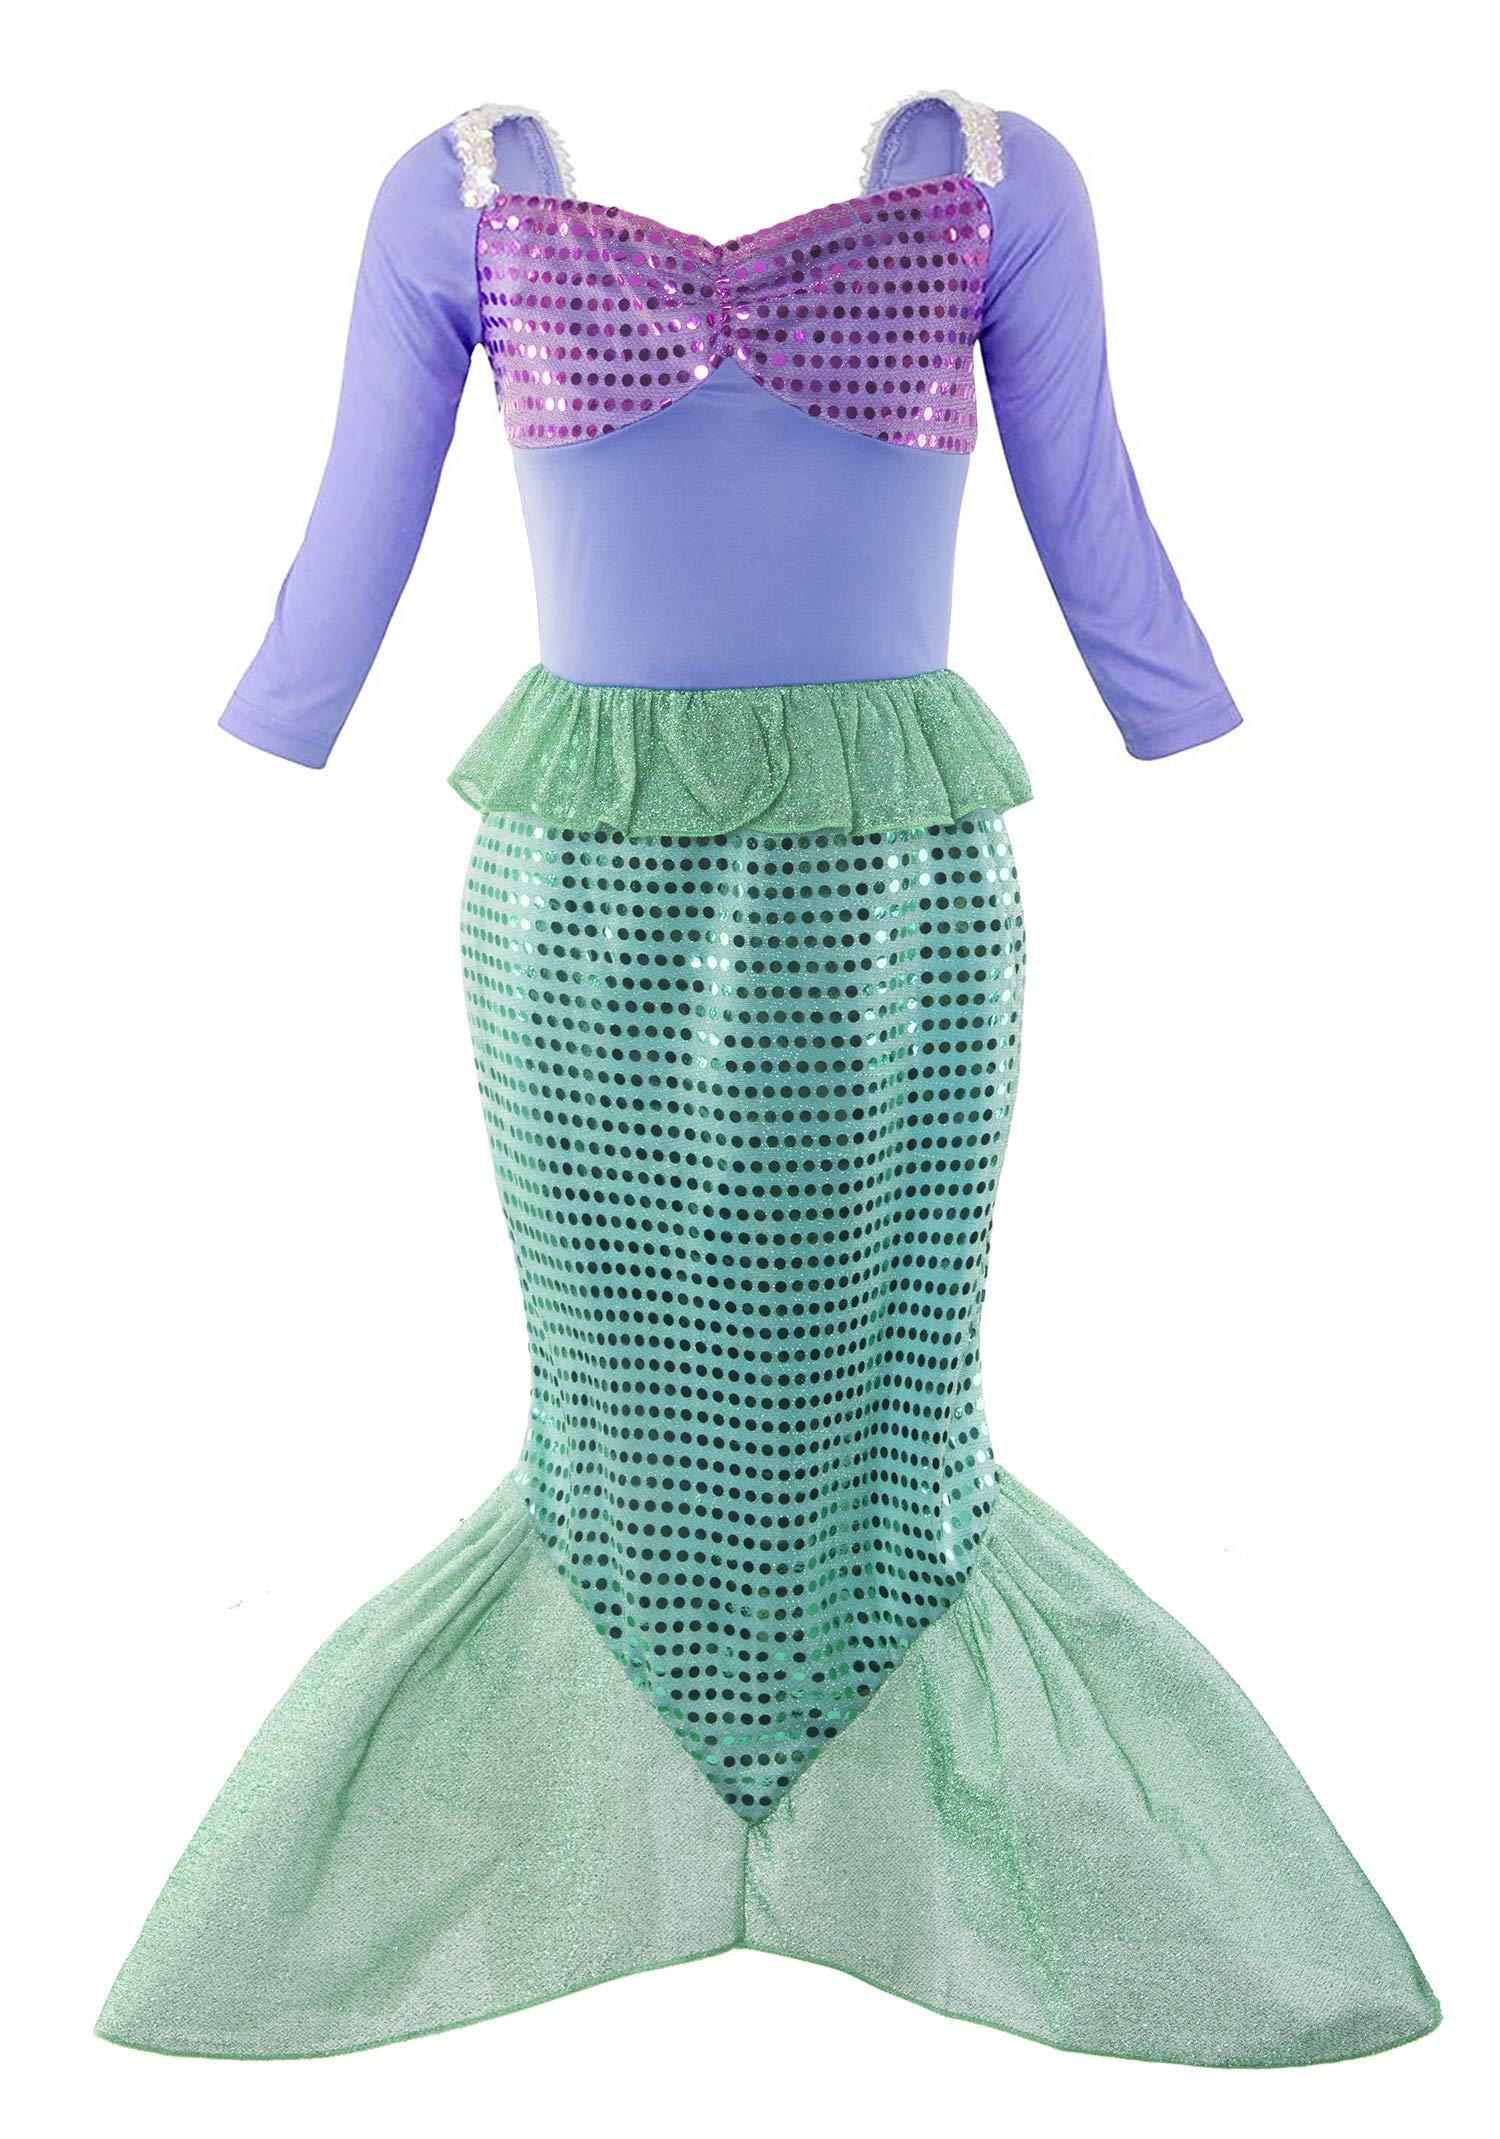 Padete Little Girl Mermaid Princess Costume Sequins Party Dress